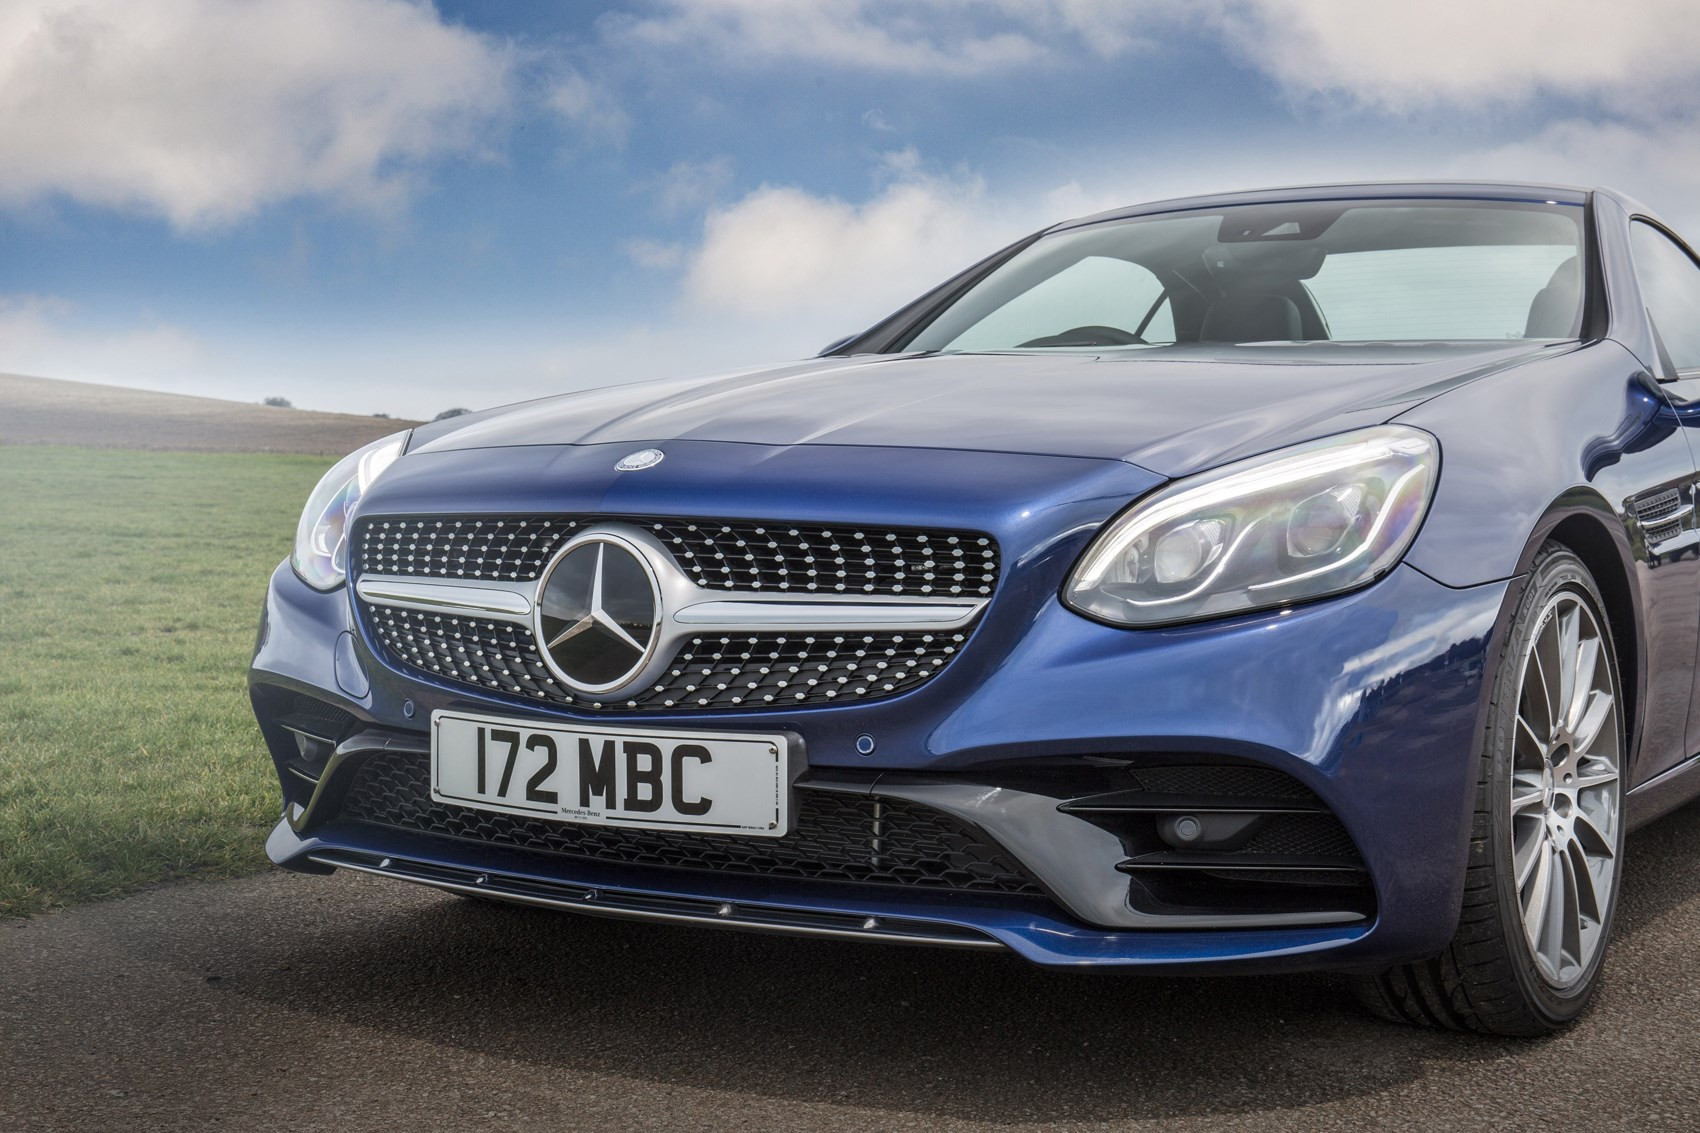 Mercedes benz slc class convertible 2016 photos parkers for Mercedes benz detailing